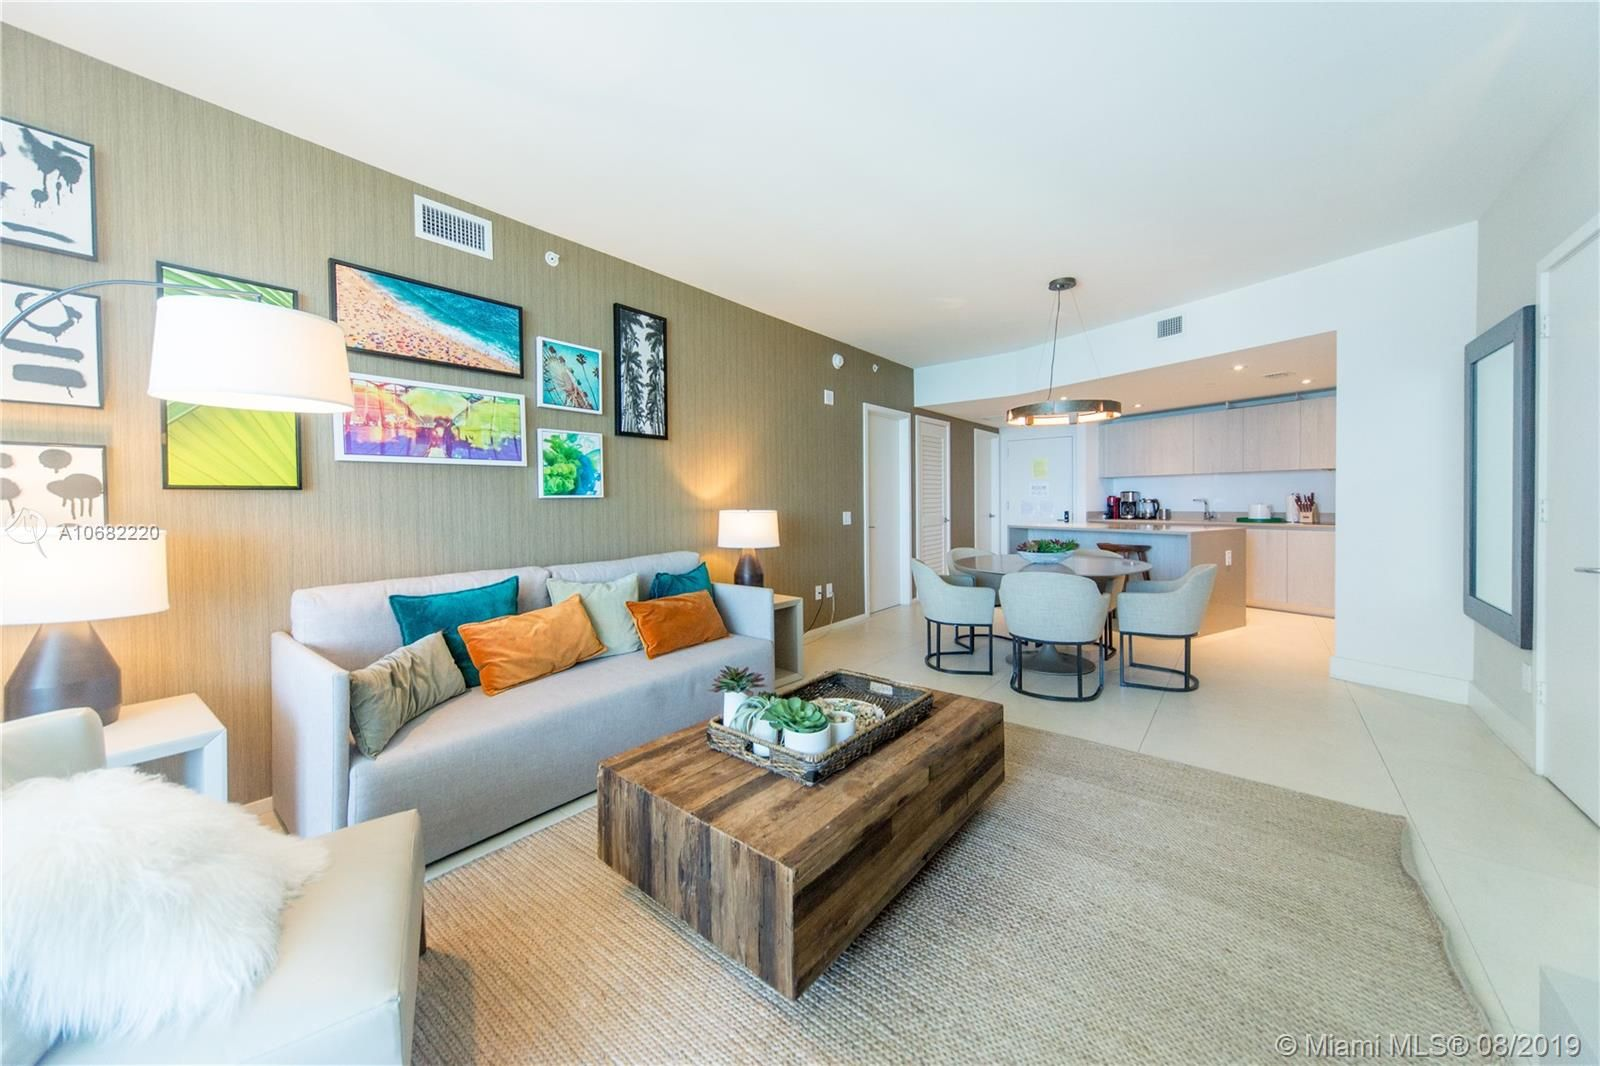 property photo imagens) Residencial, Vender casa